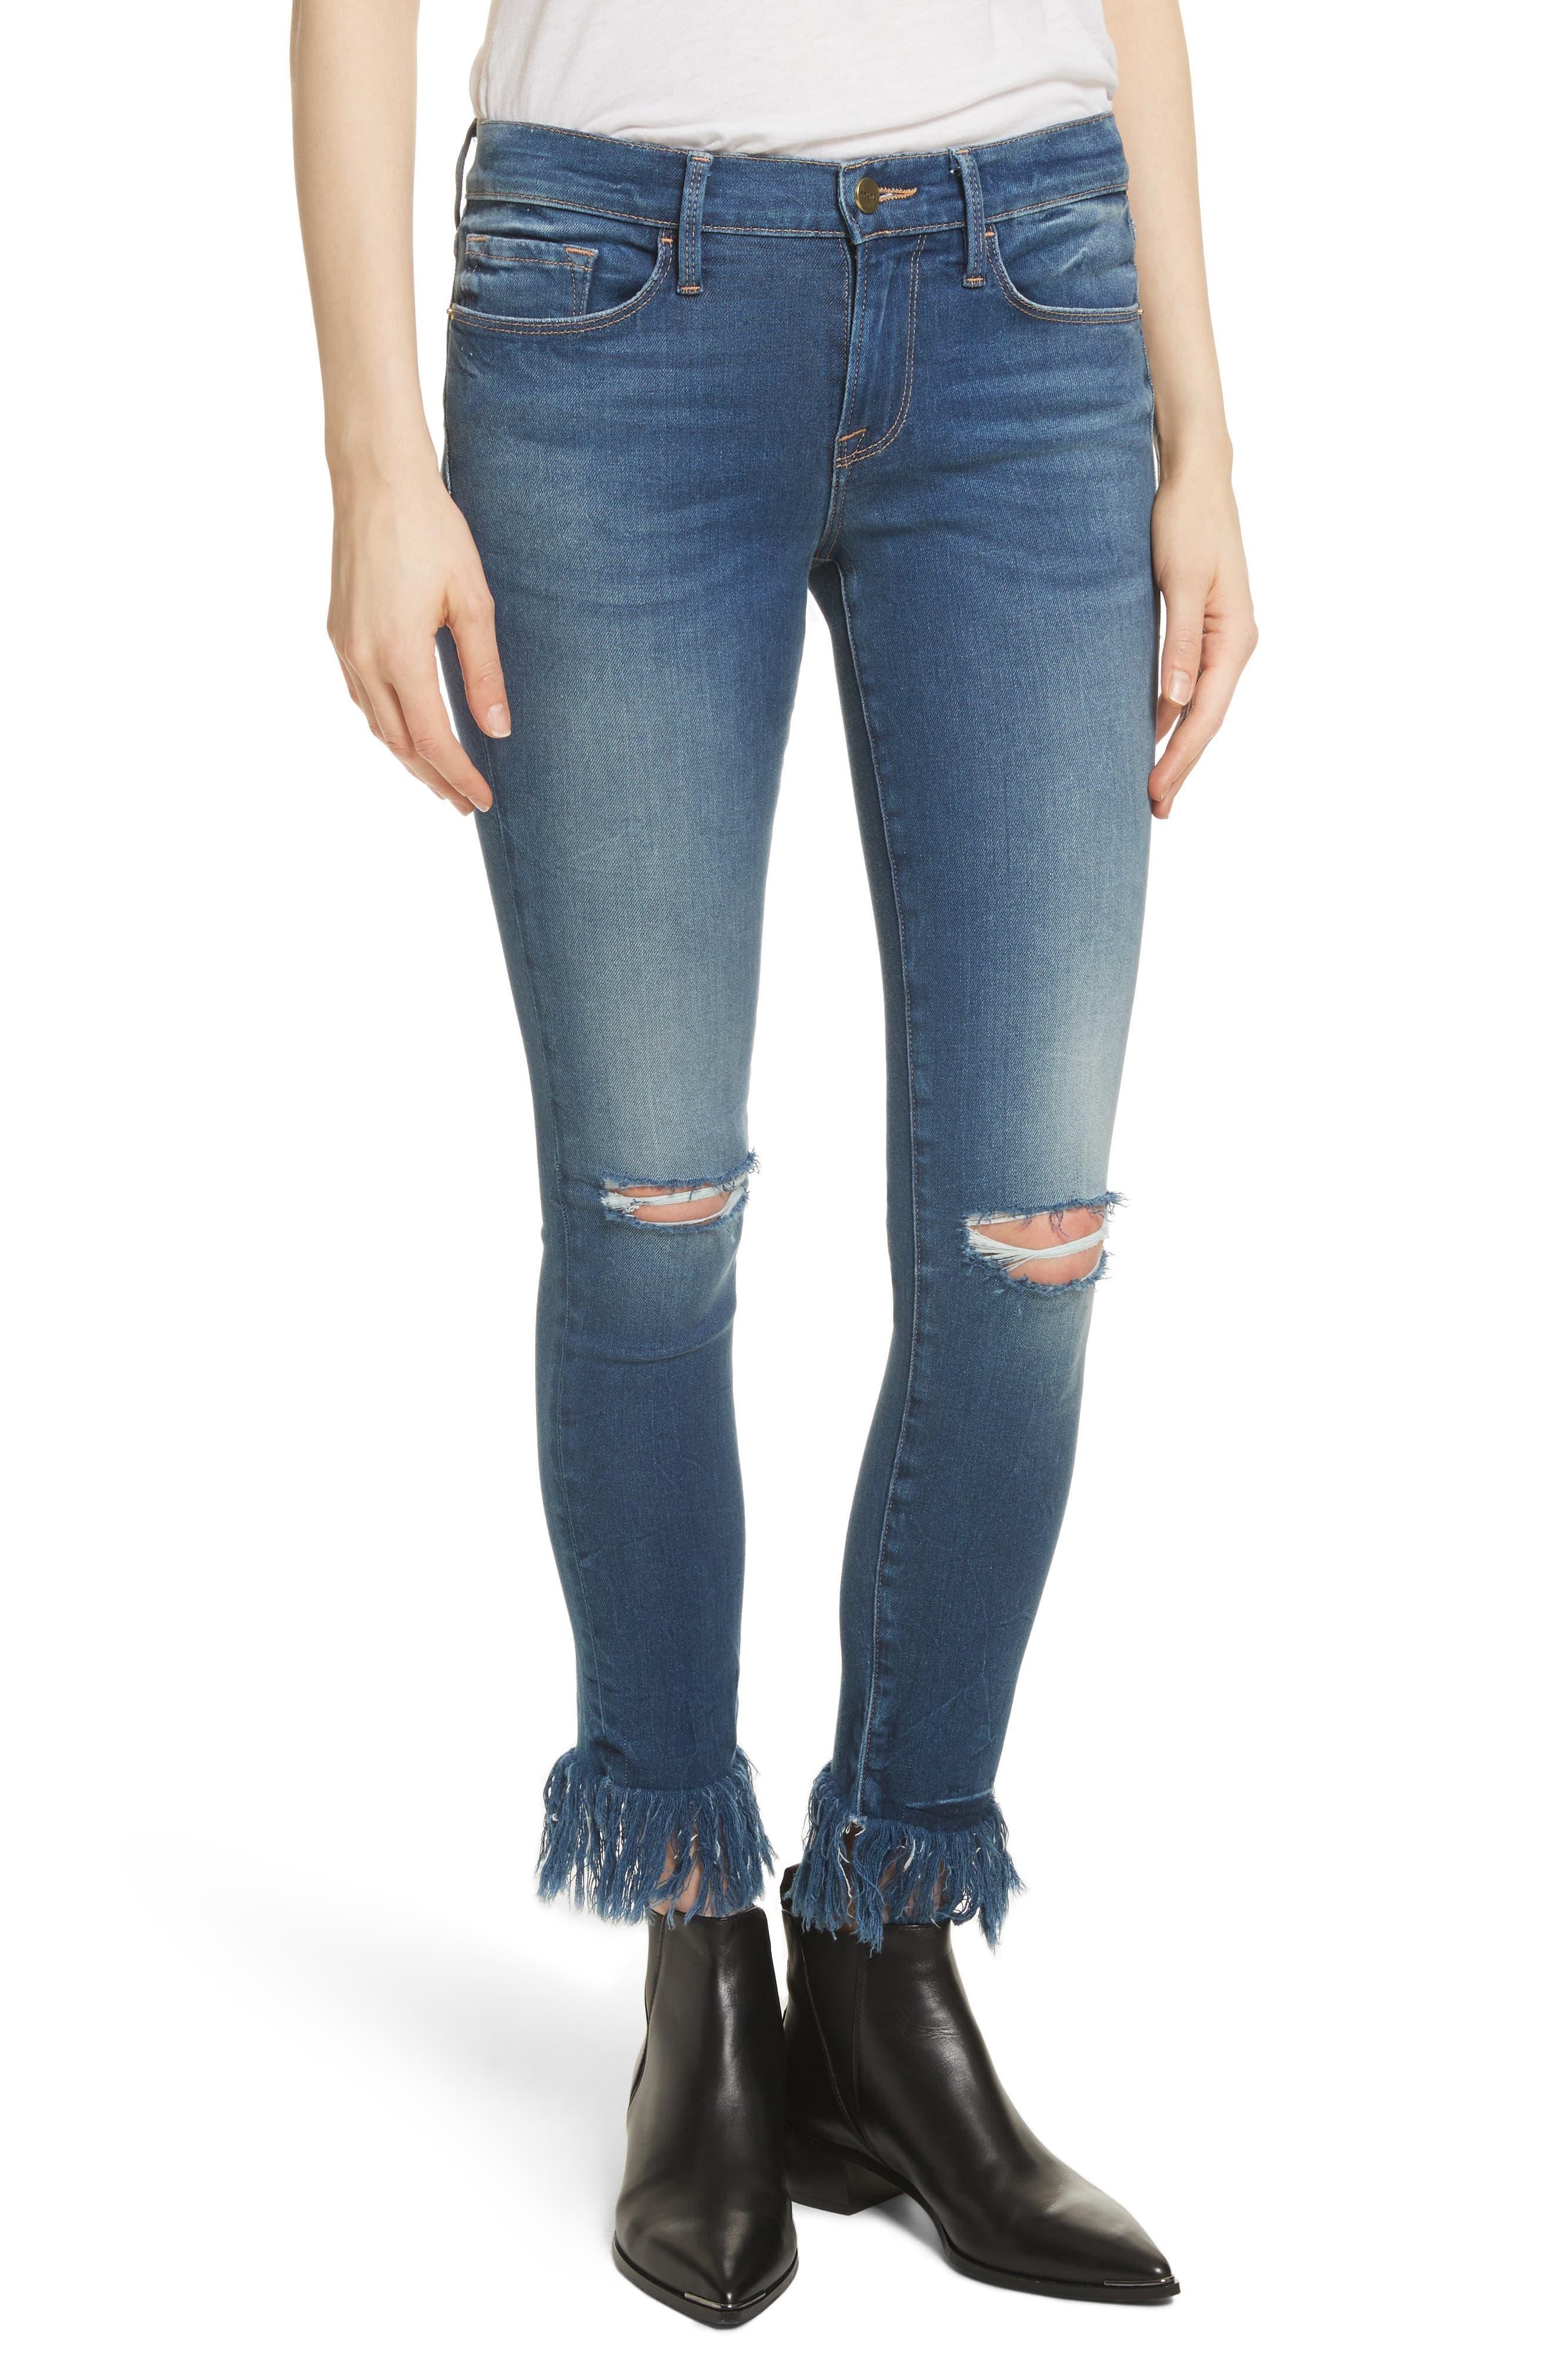 Le Skinny de Jeanne Shredded Raw Hem Jeans,                         Main,                         color, 401